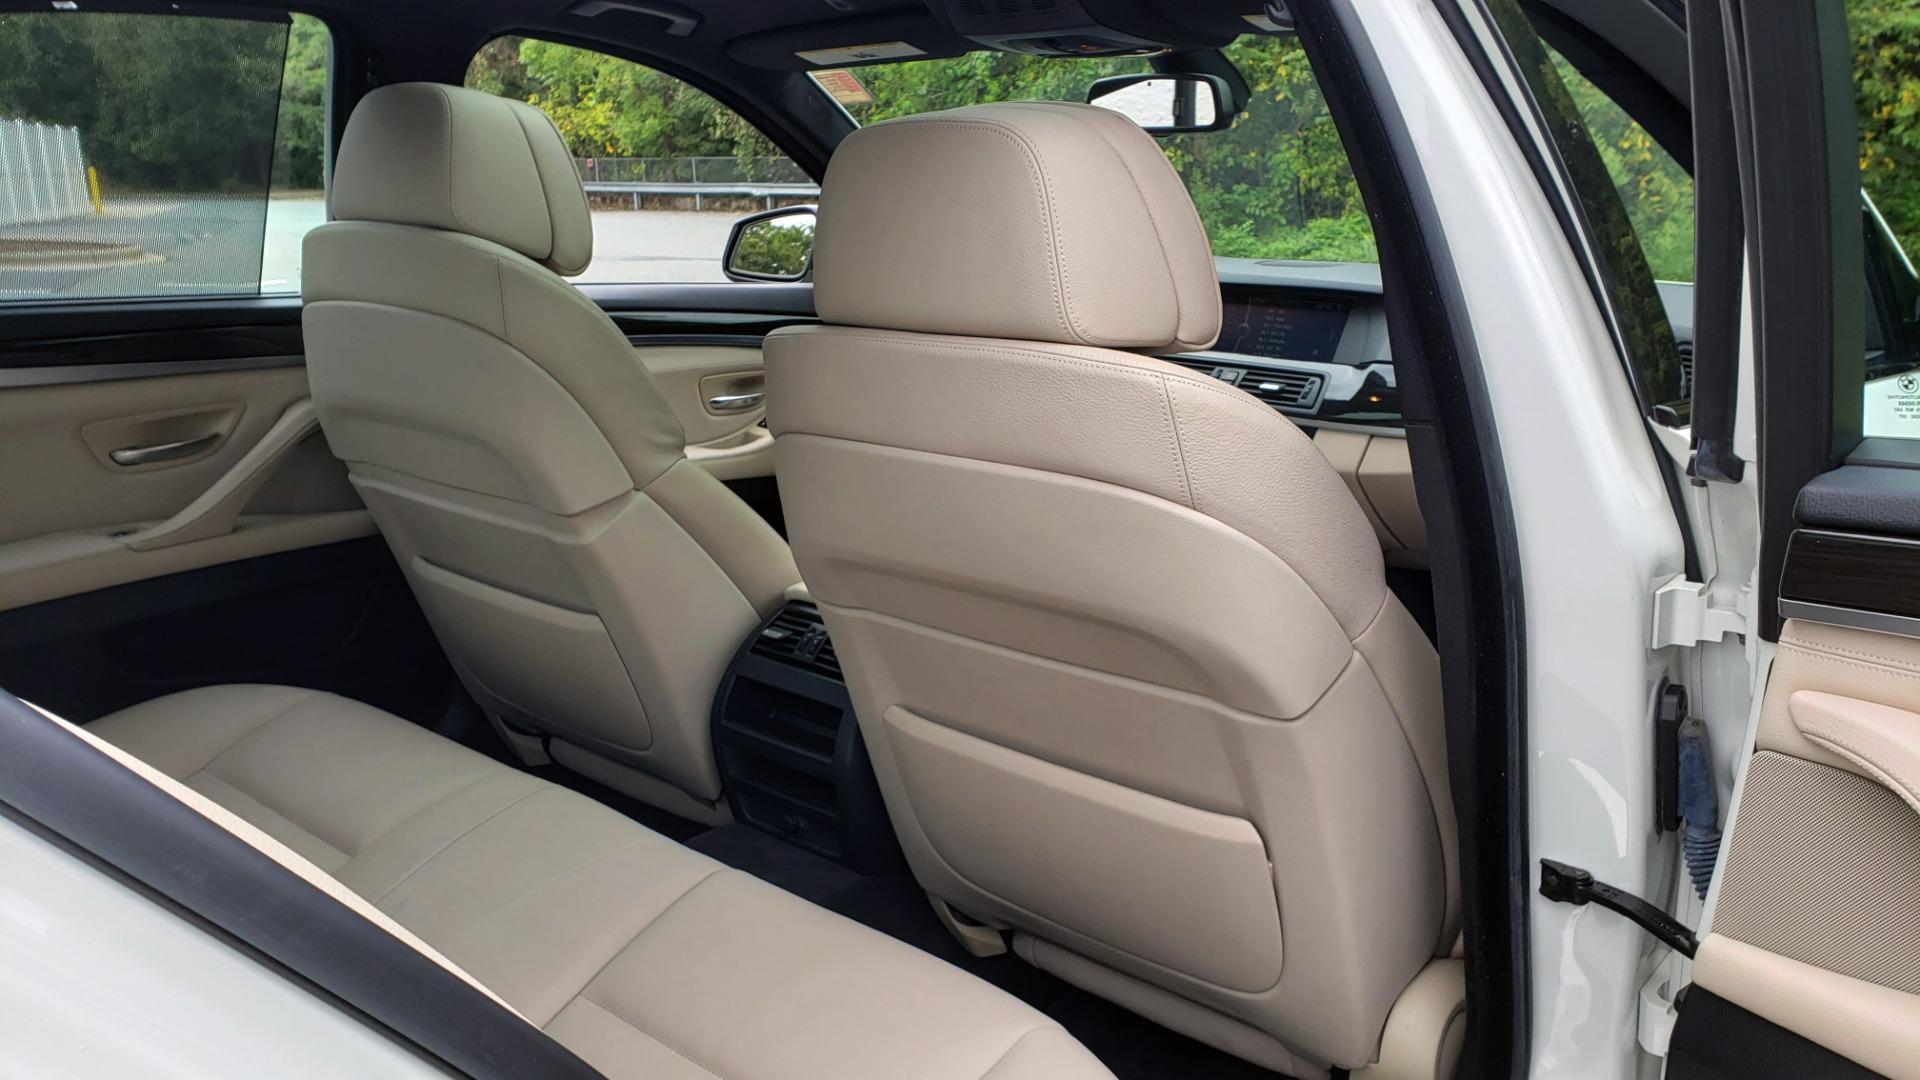 Used 2012 BMW 5 SERIES 550I M SPORT / NAV / CONV PKG / SUNROOF / PREM SND / REARVIEW for sale Sold at Formula Imports in Charlotte NC 28227 62